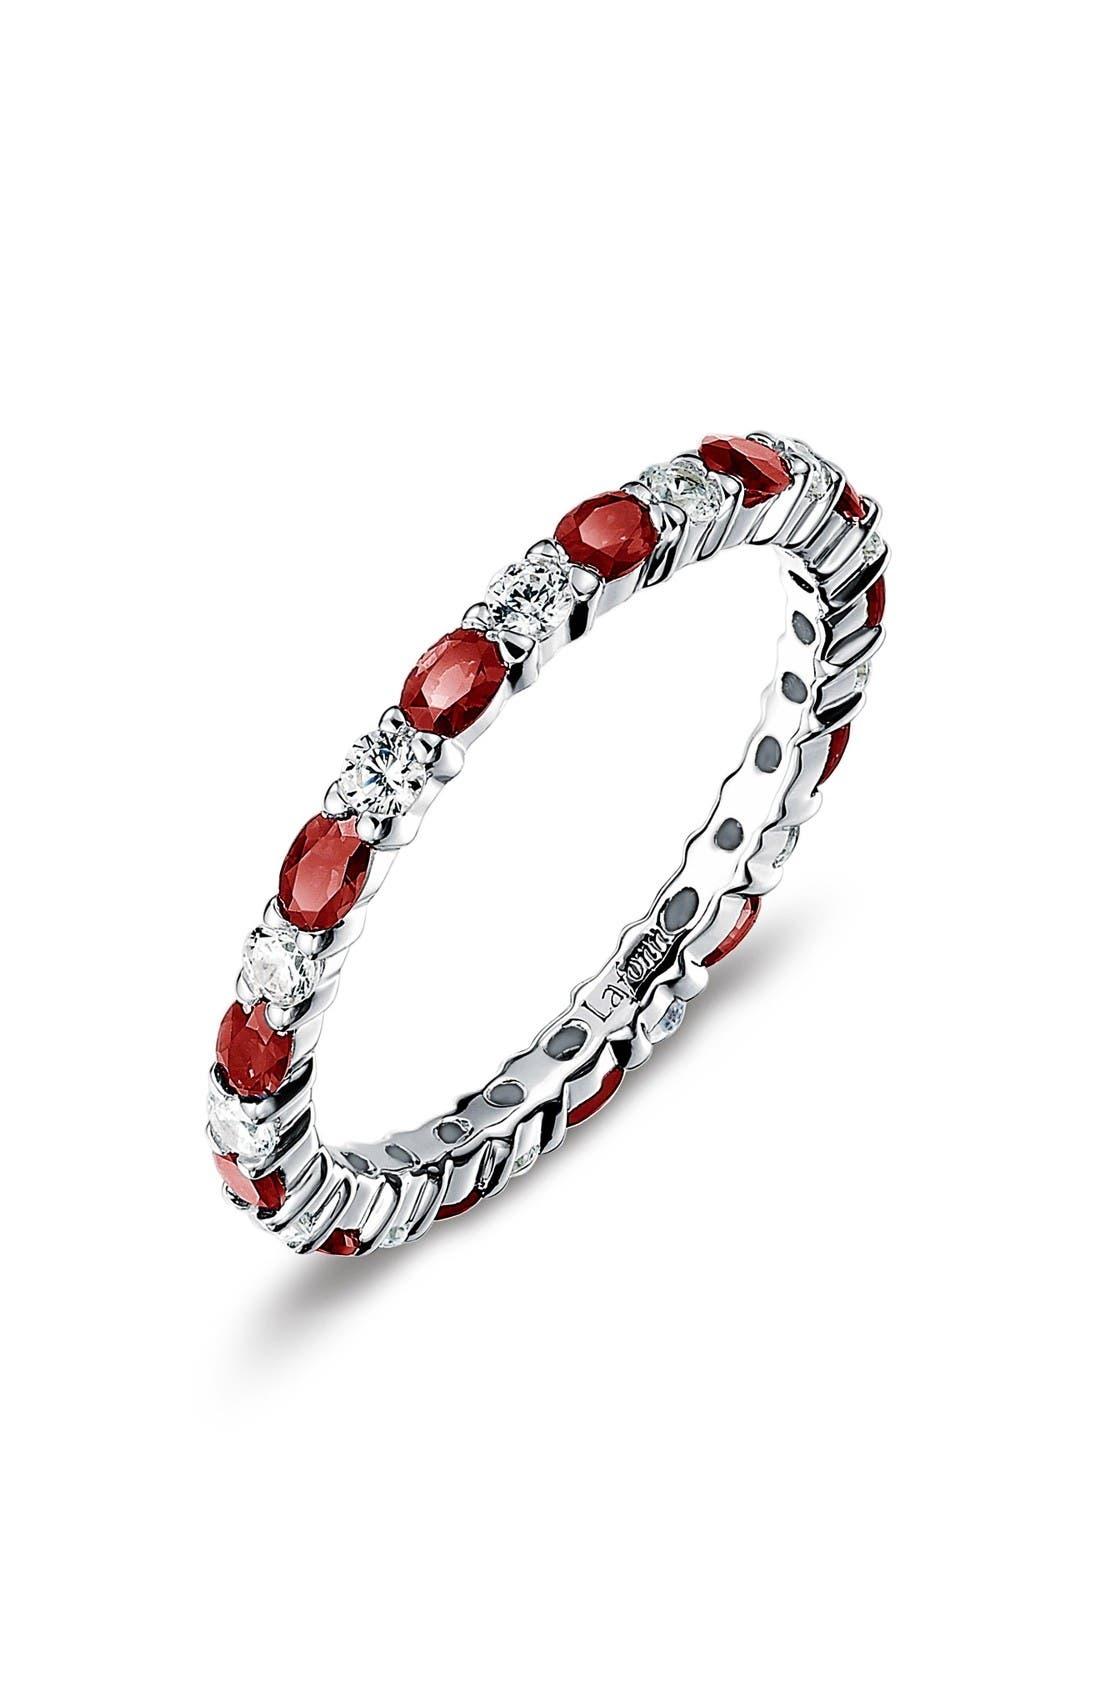 Main Image - Lafonn Simulated Diamond Birthstone Band Ring